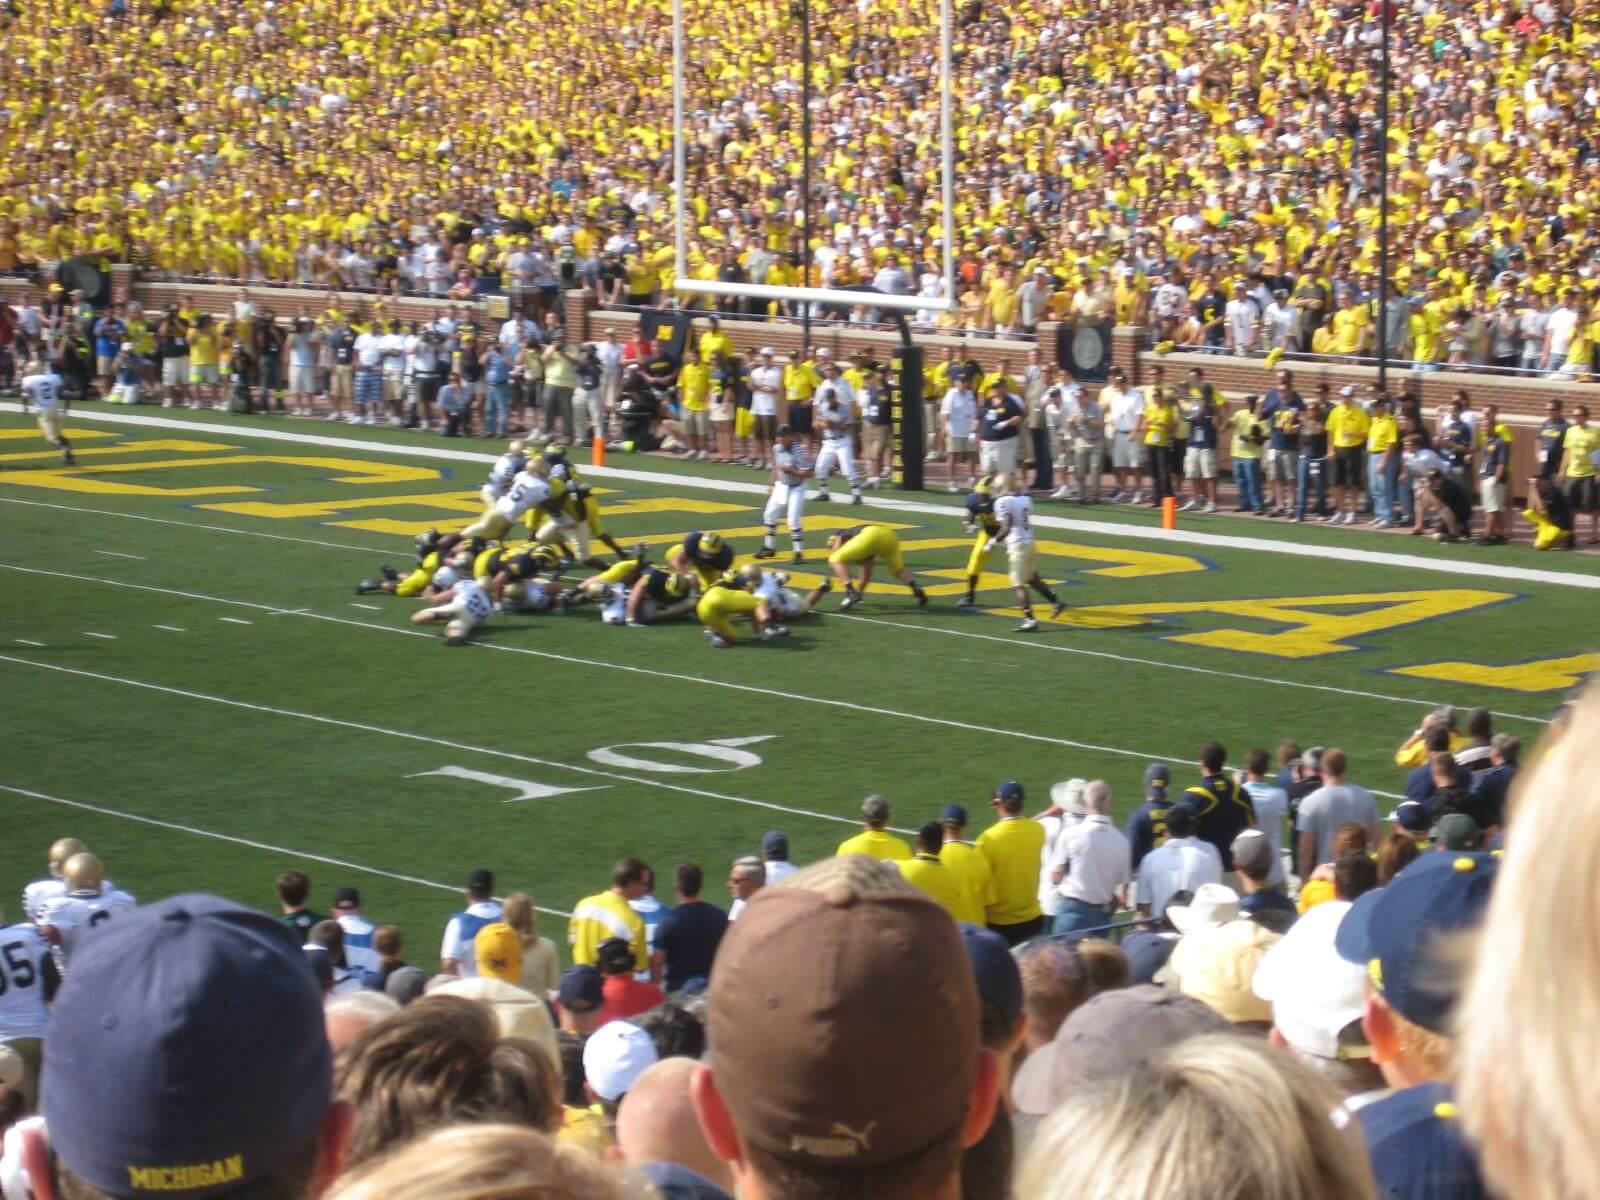 Michigan vs Notre Dame football game